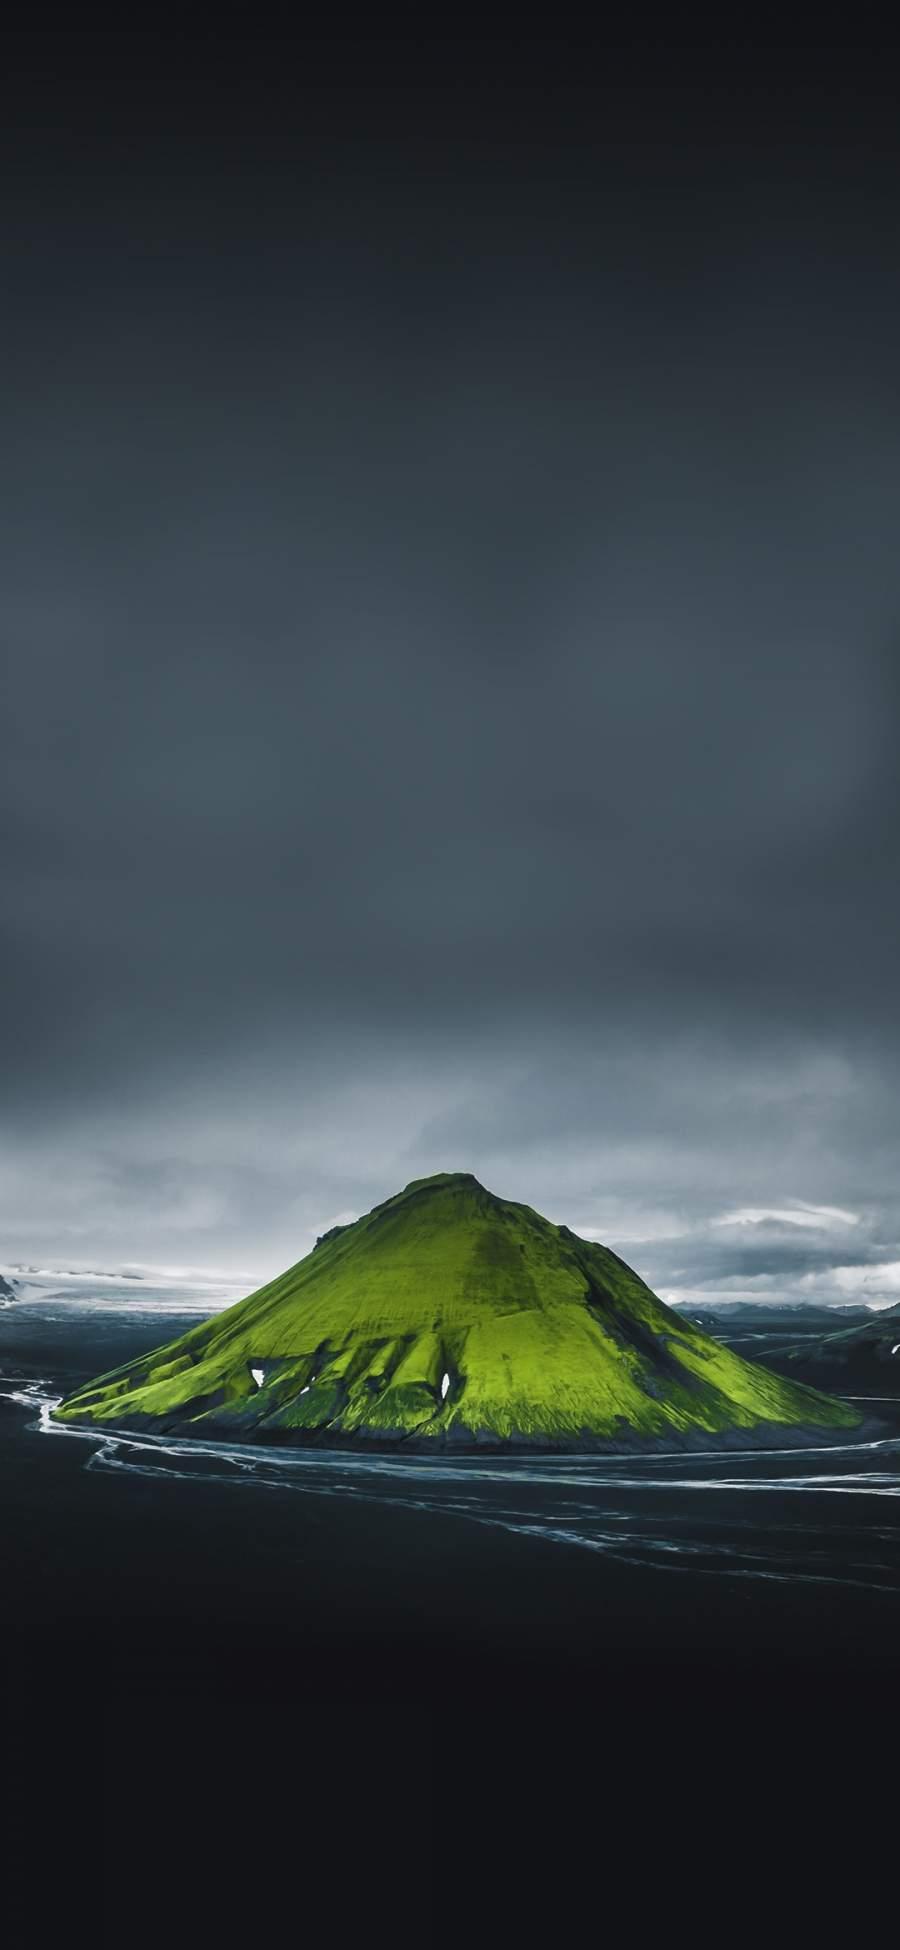 Green Mountain iPhone Wallpaper